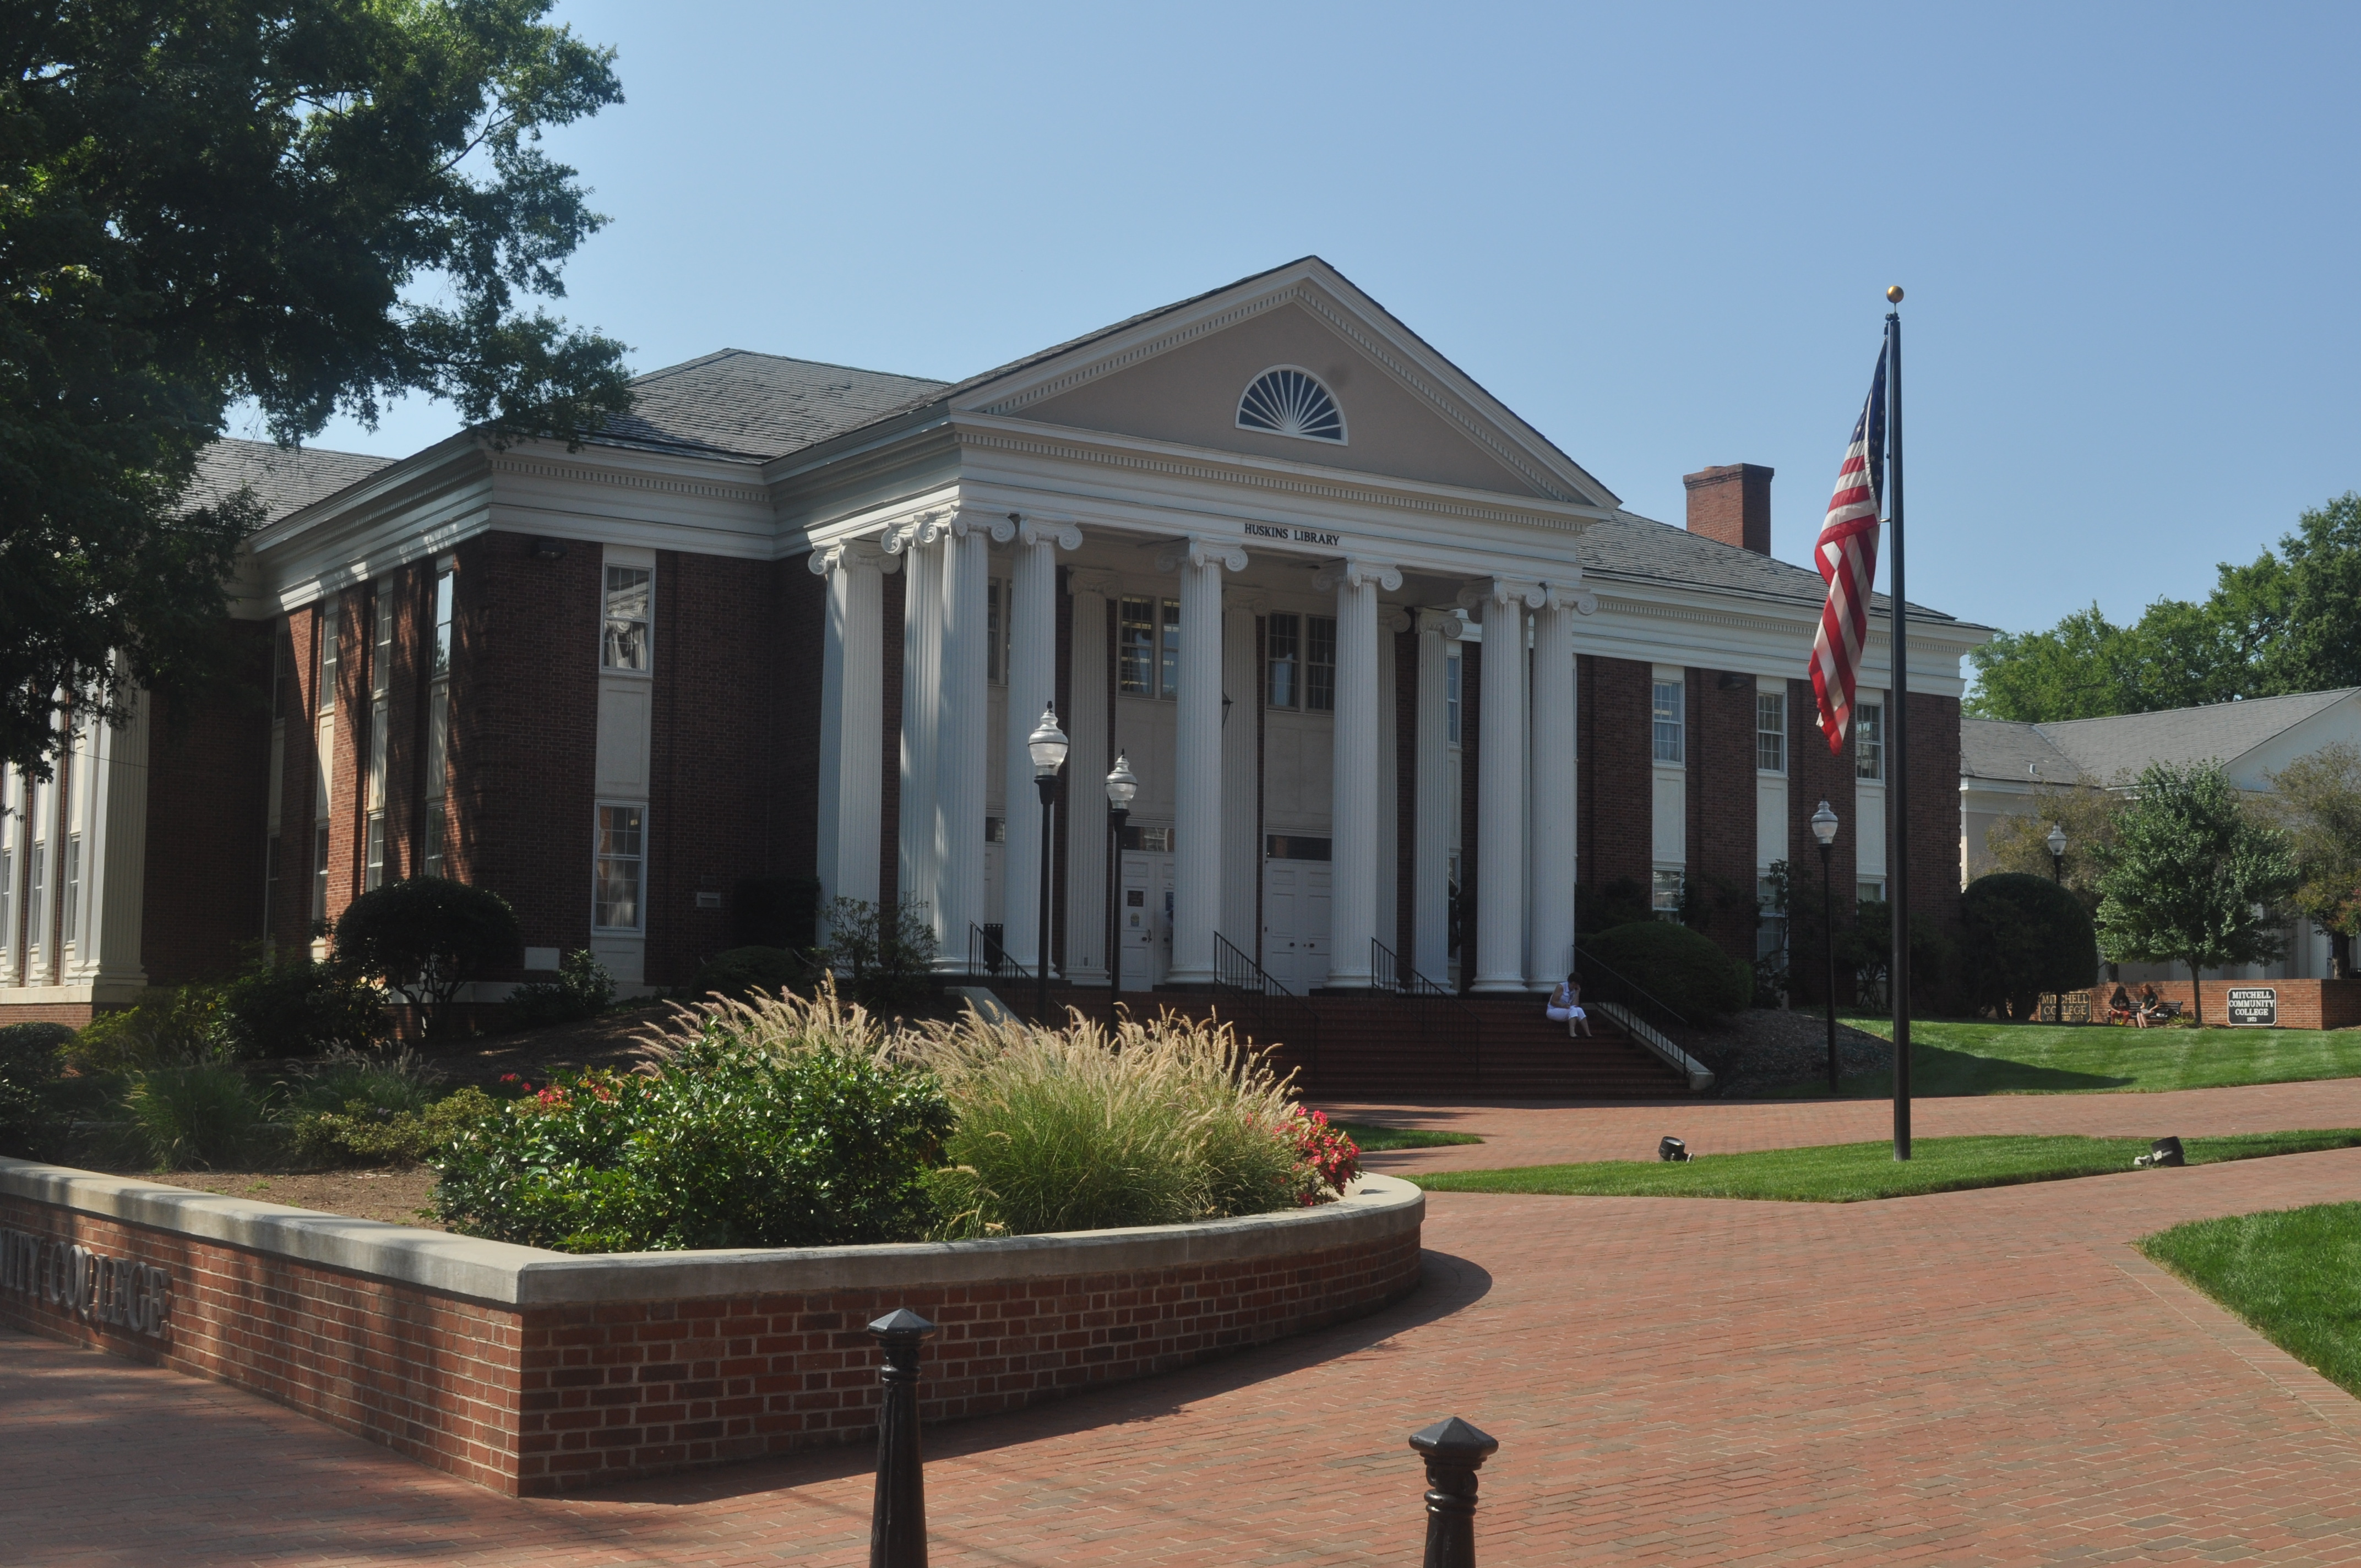 Huskins Library